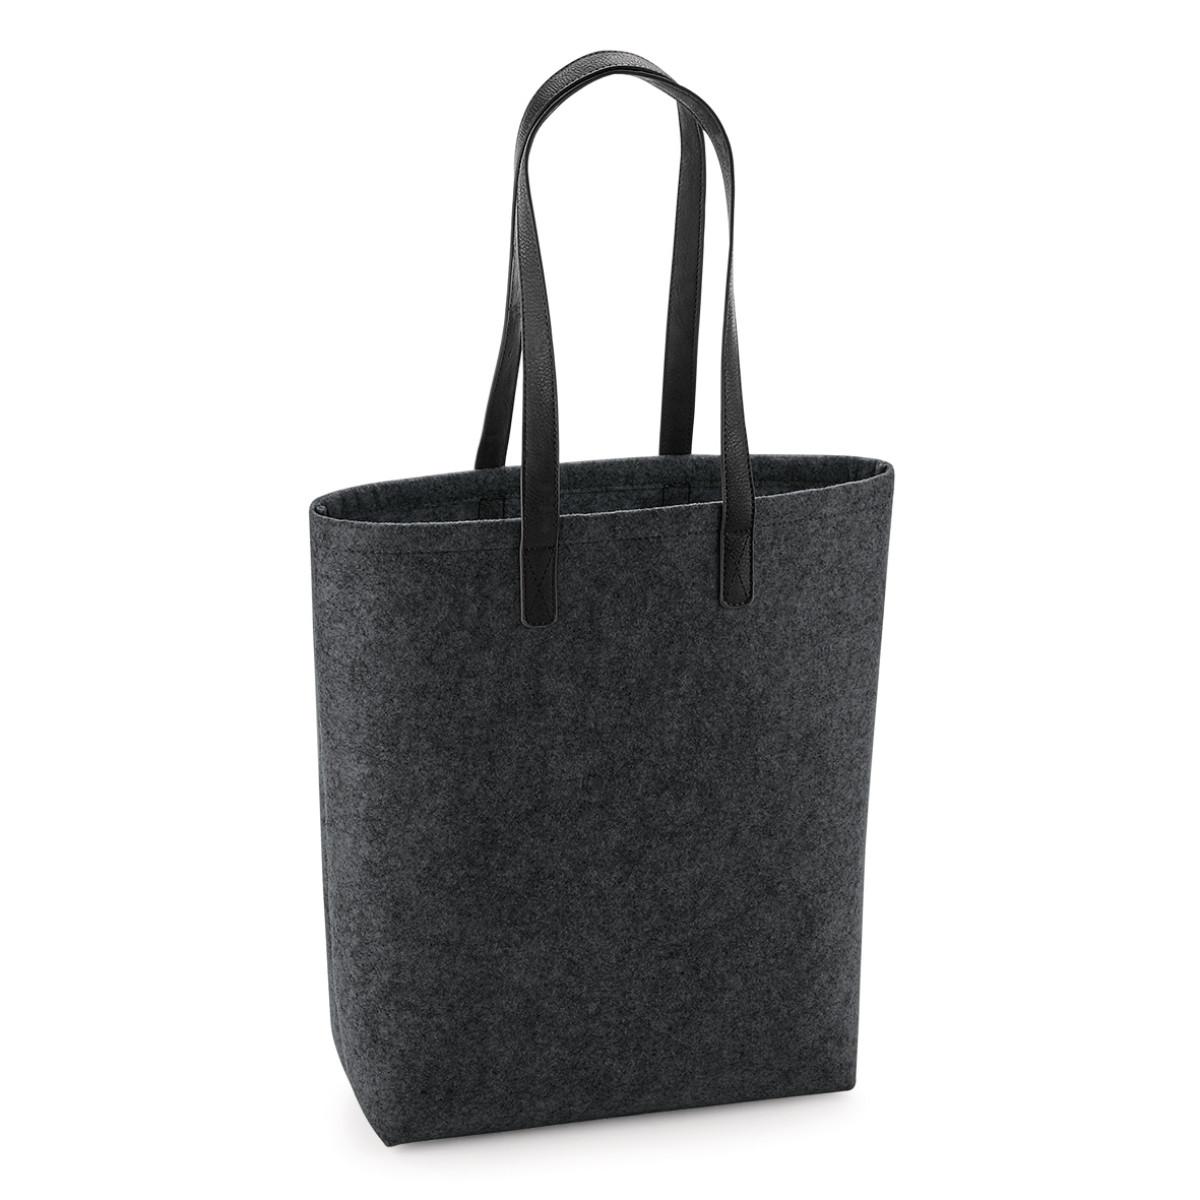 Bagbase Premium Felt Tote